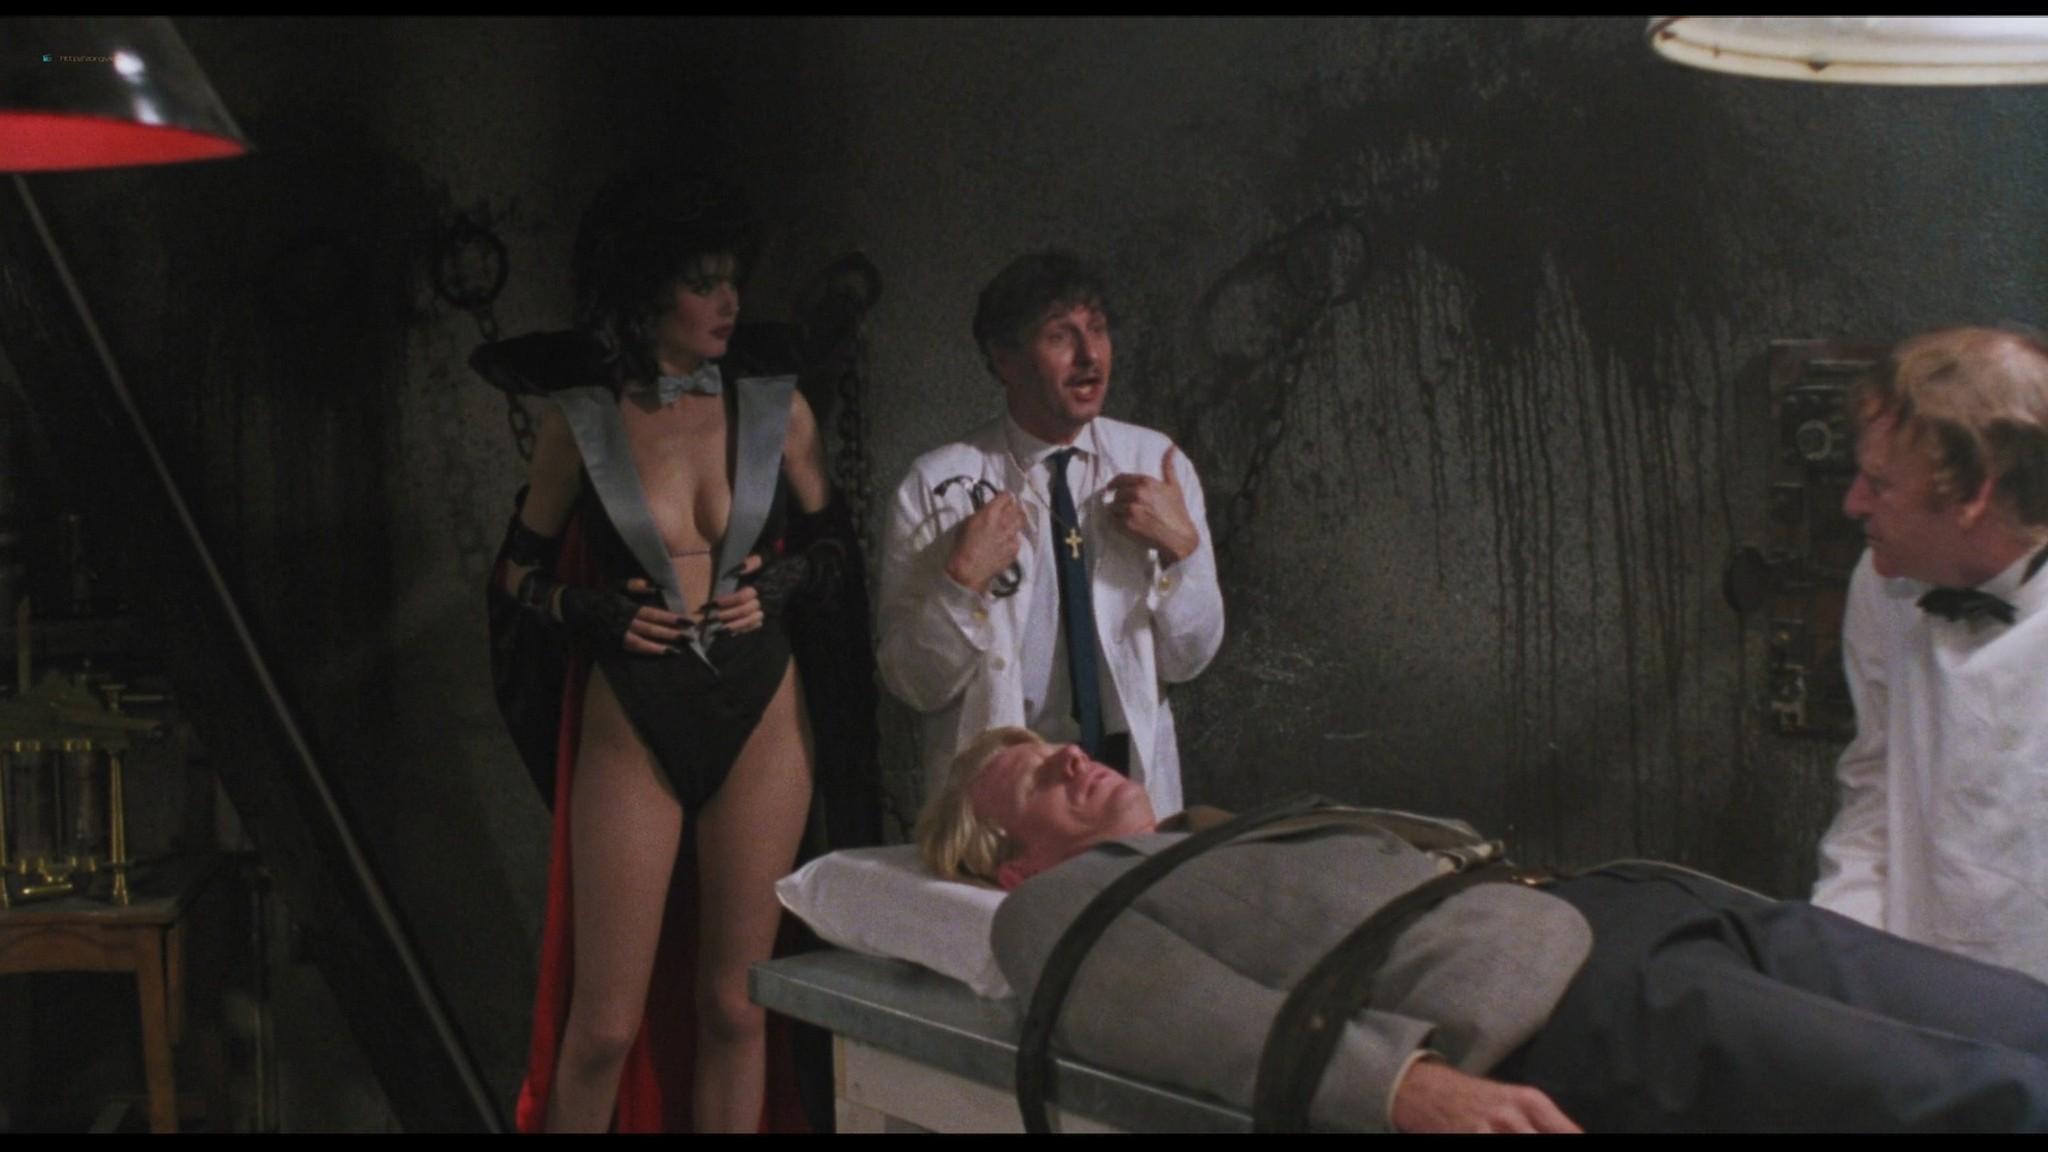 Geena Davis hot and sexy Ksenia Prohaska sexy - Transylvania 6-5000 (1985) HD 1080p BluRay (10)